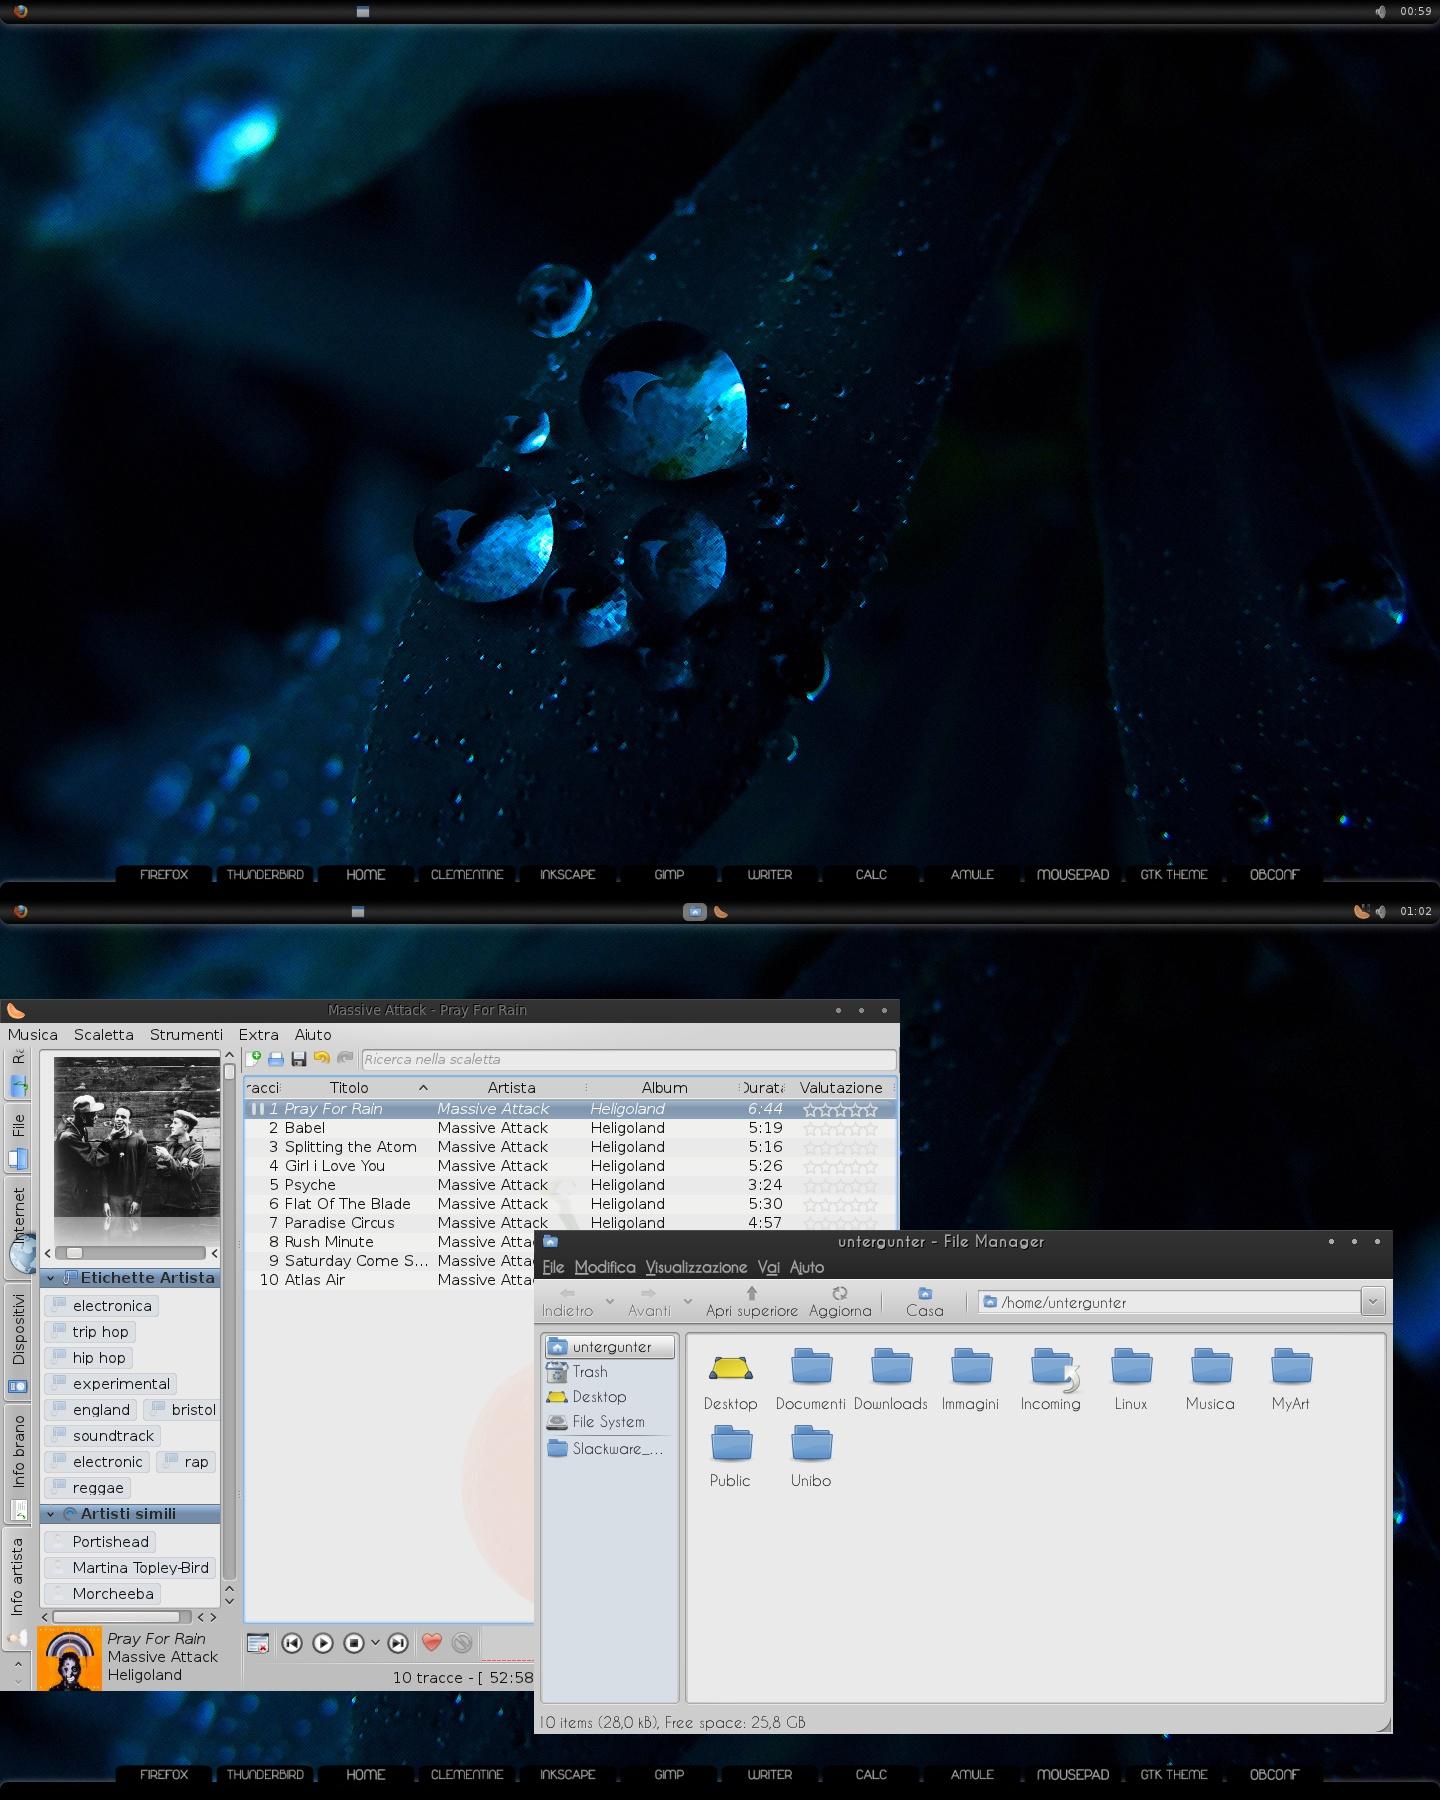 Openbox screenshot by Untergunter